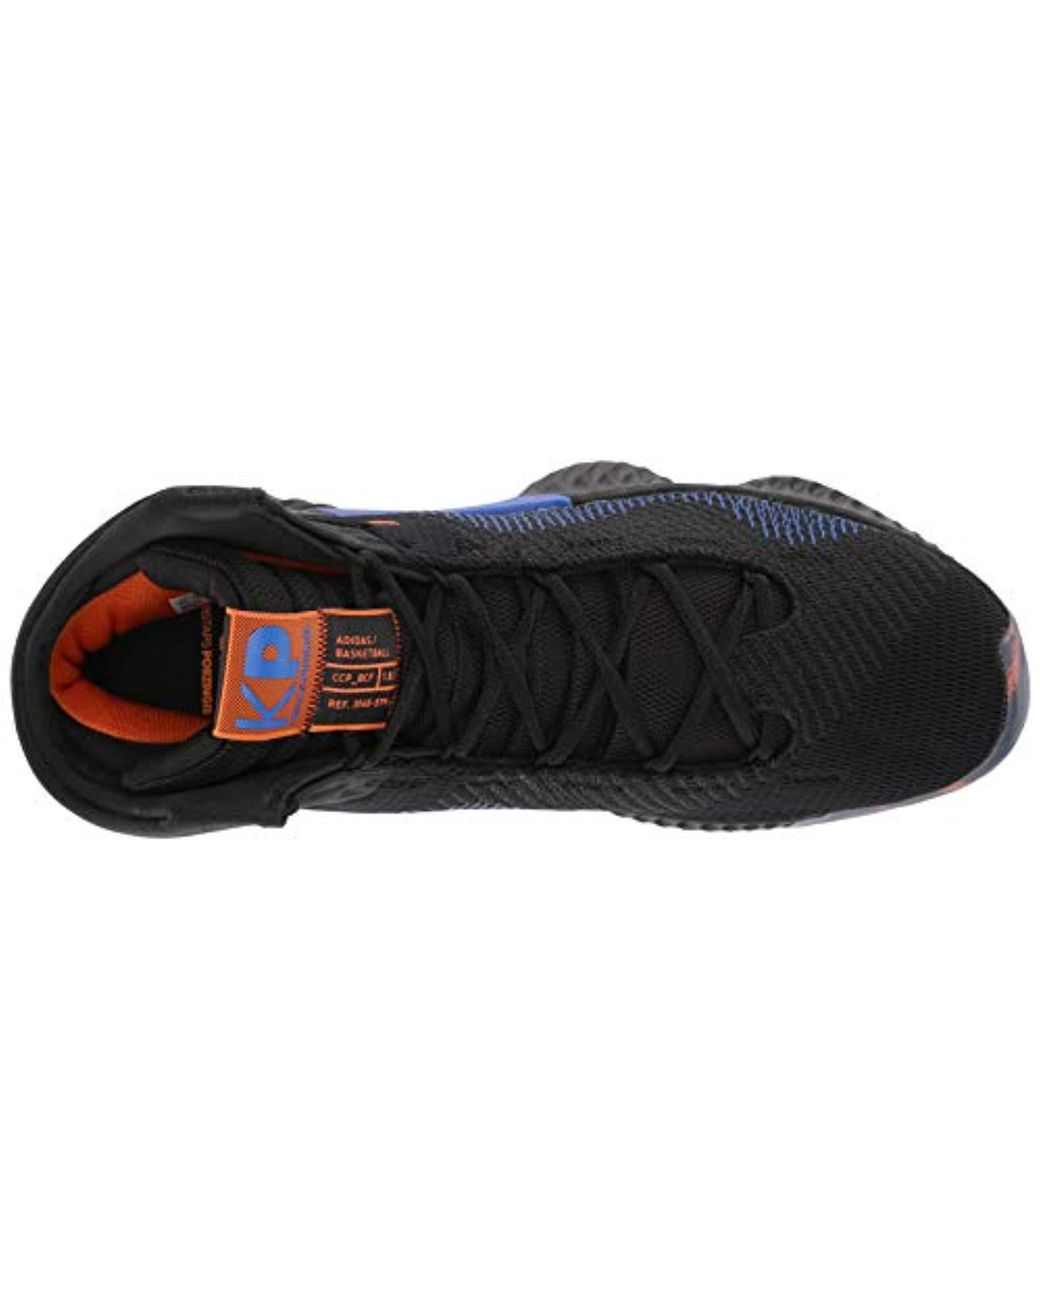 938f0e162 Lyst - adidas Originals Pro Bounce 2018 Basketball Shoe in Black for Men